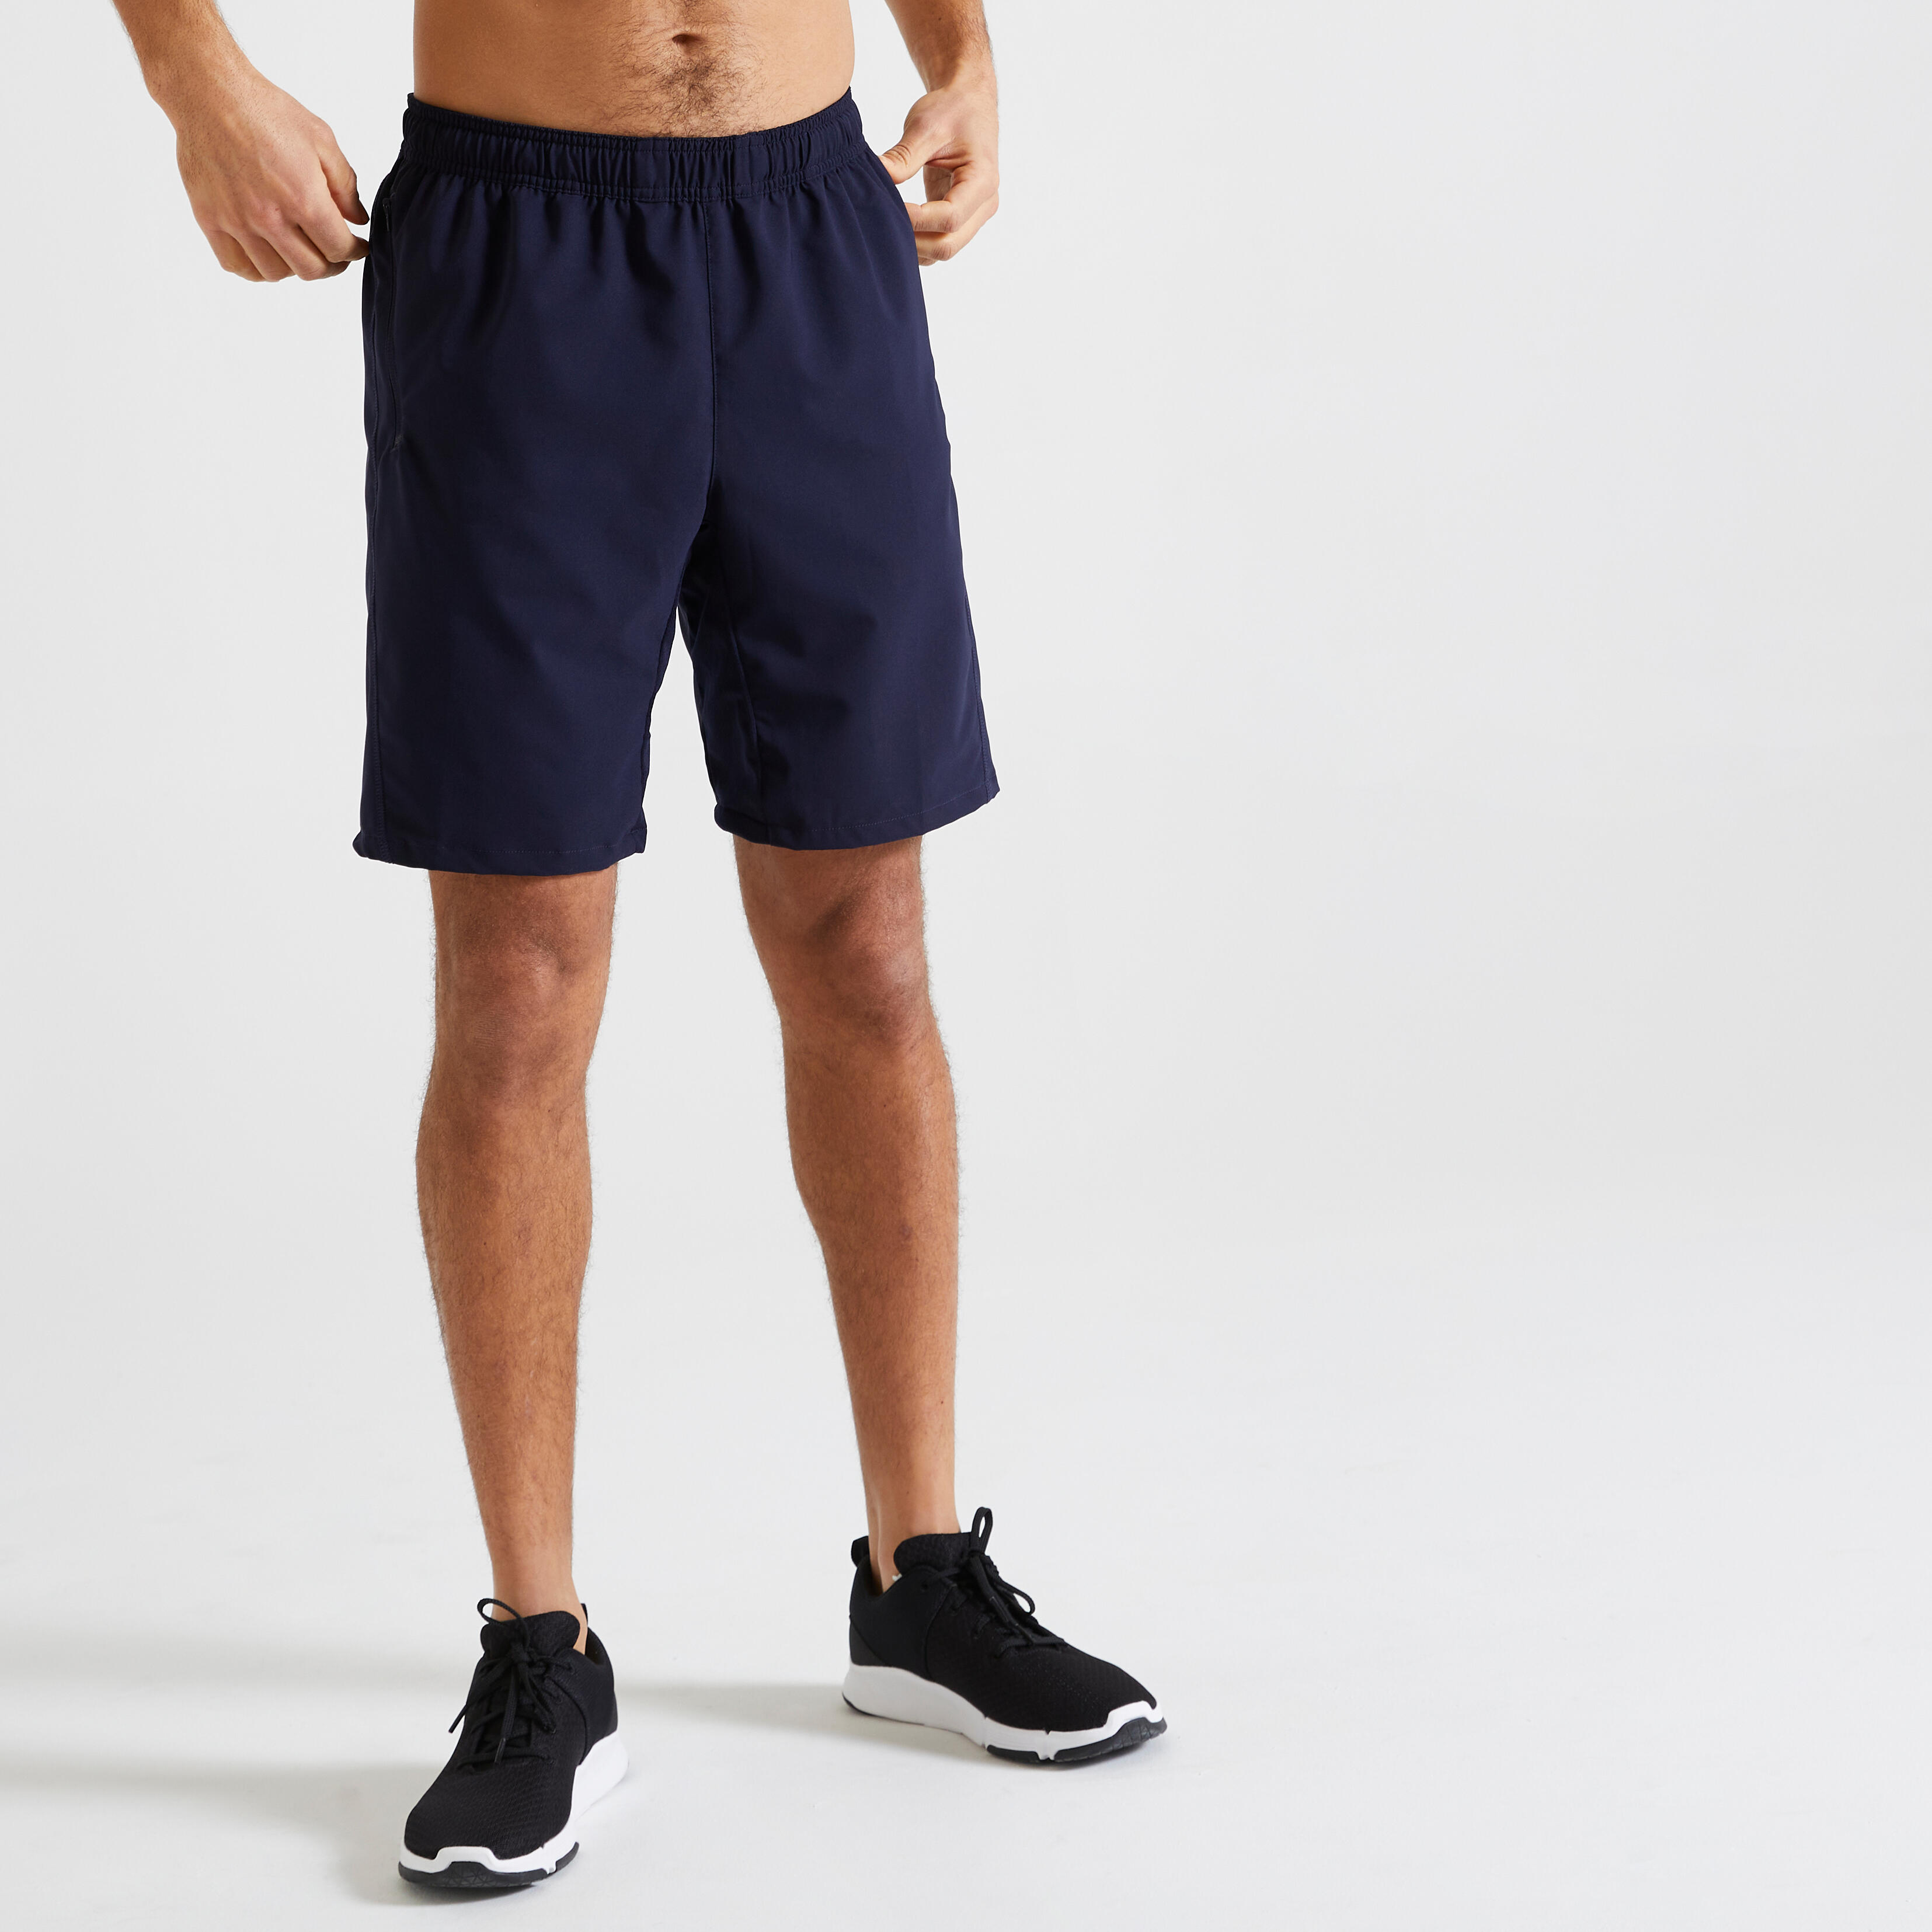 Șort Fitness 120 Bărbați imagine